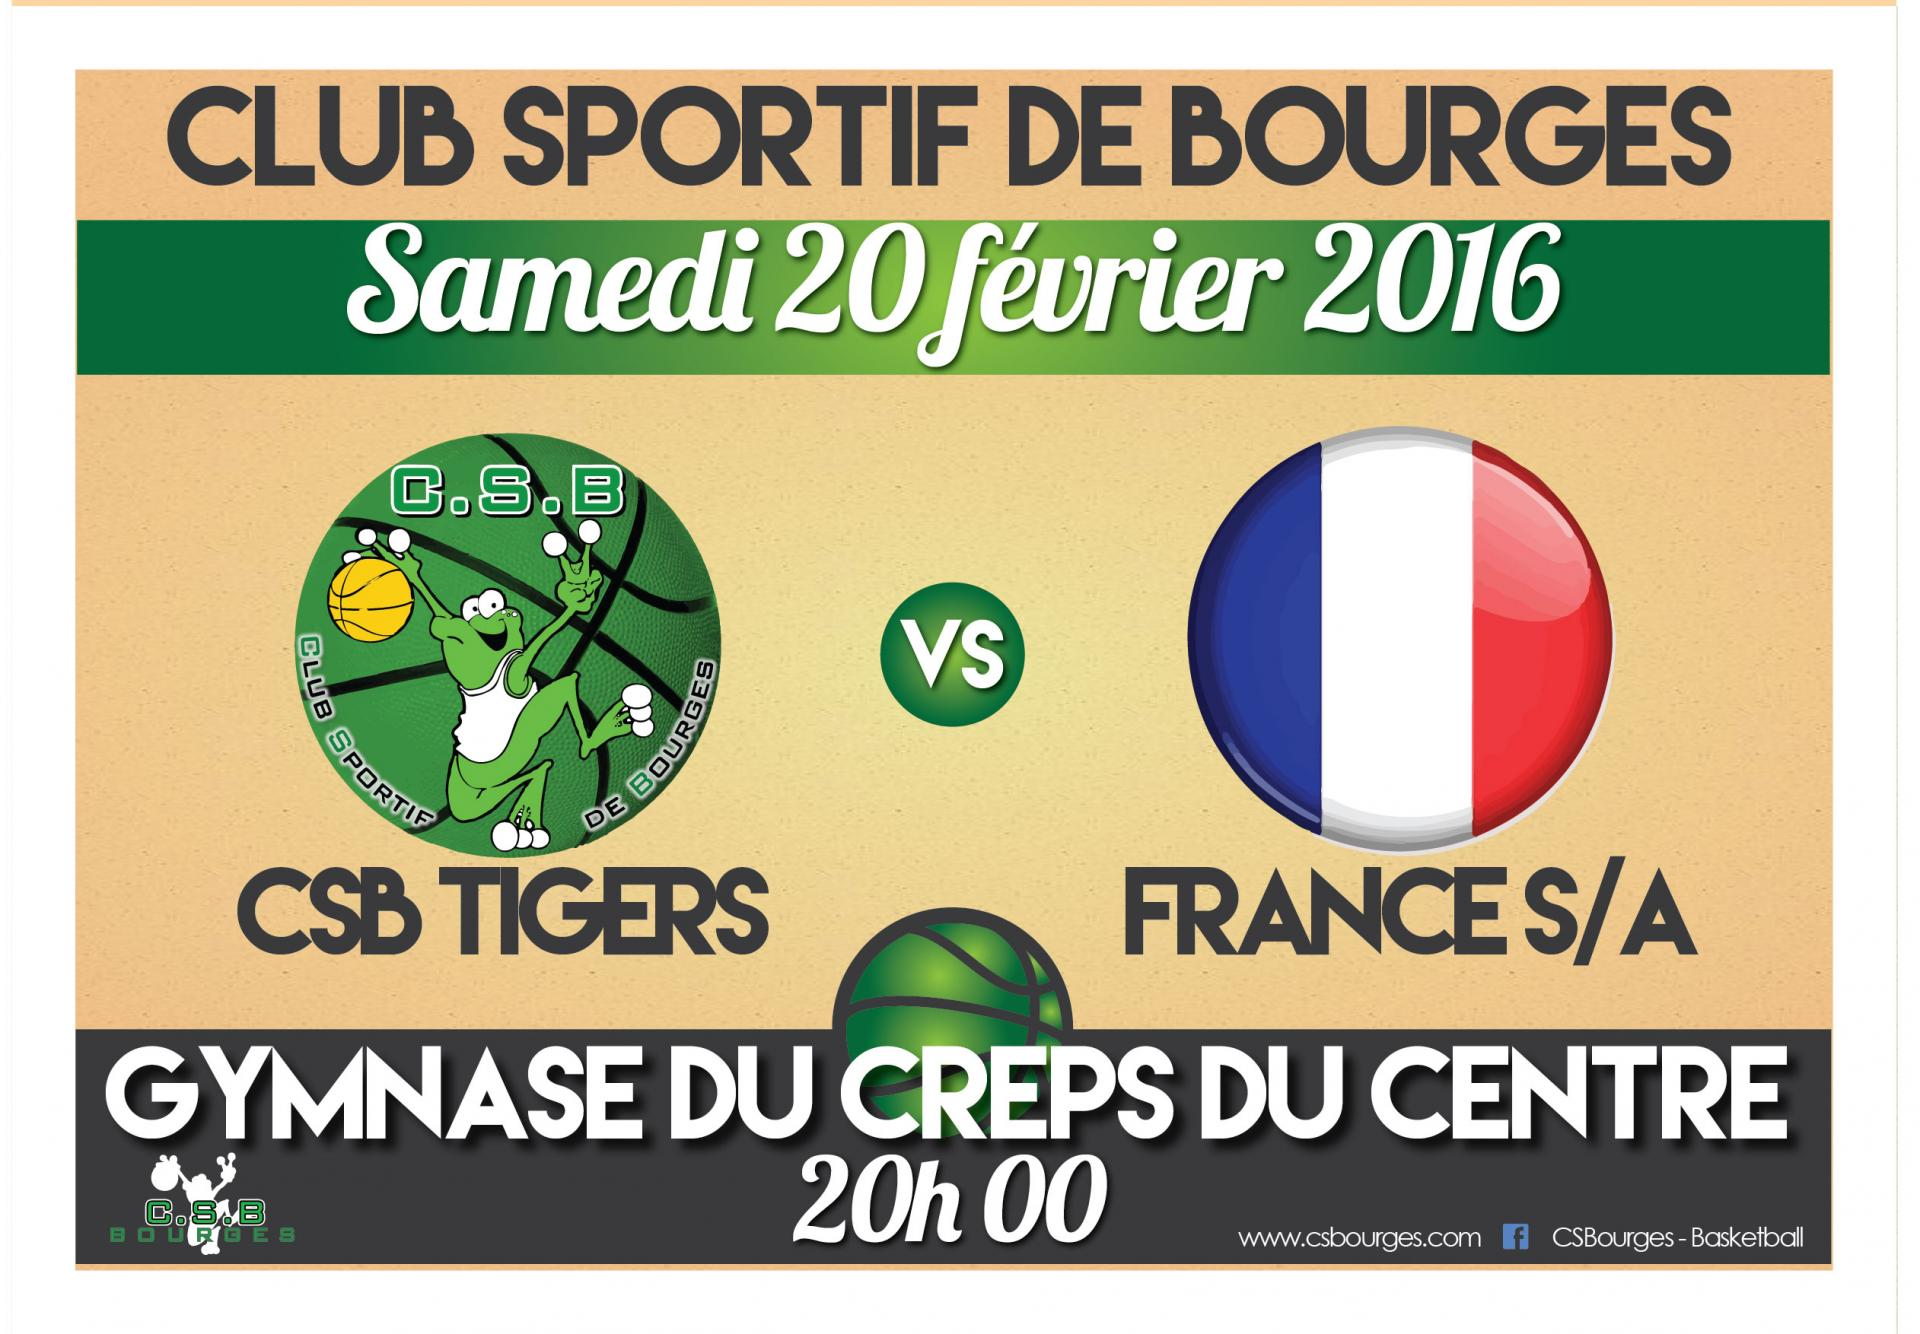 Affiche match france sa 2016